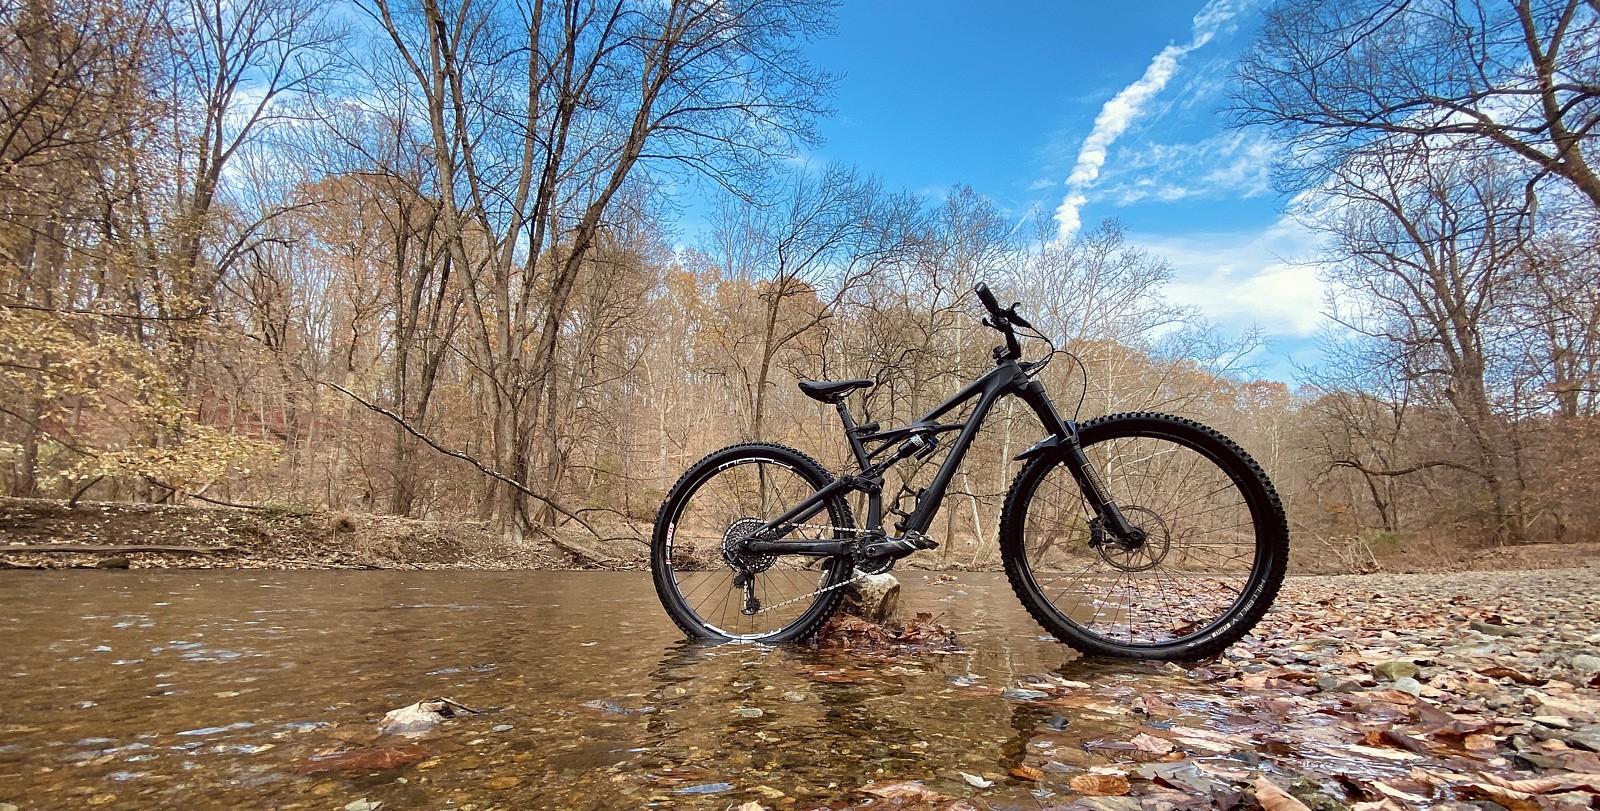 IMG 2369 - Broken_spoke.photo - Mountain Biking Pictures - Vital MTB